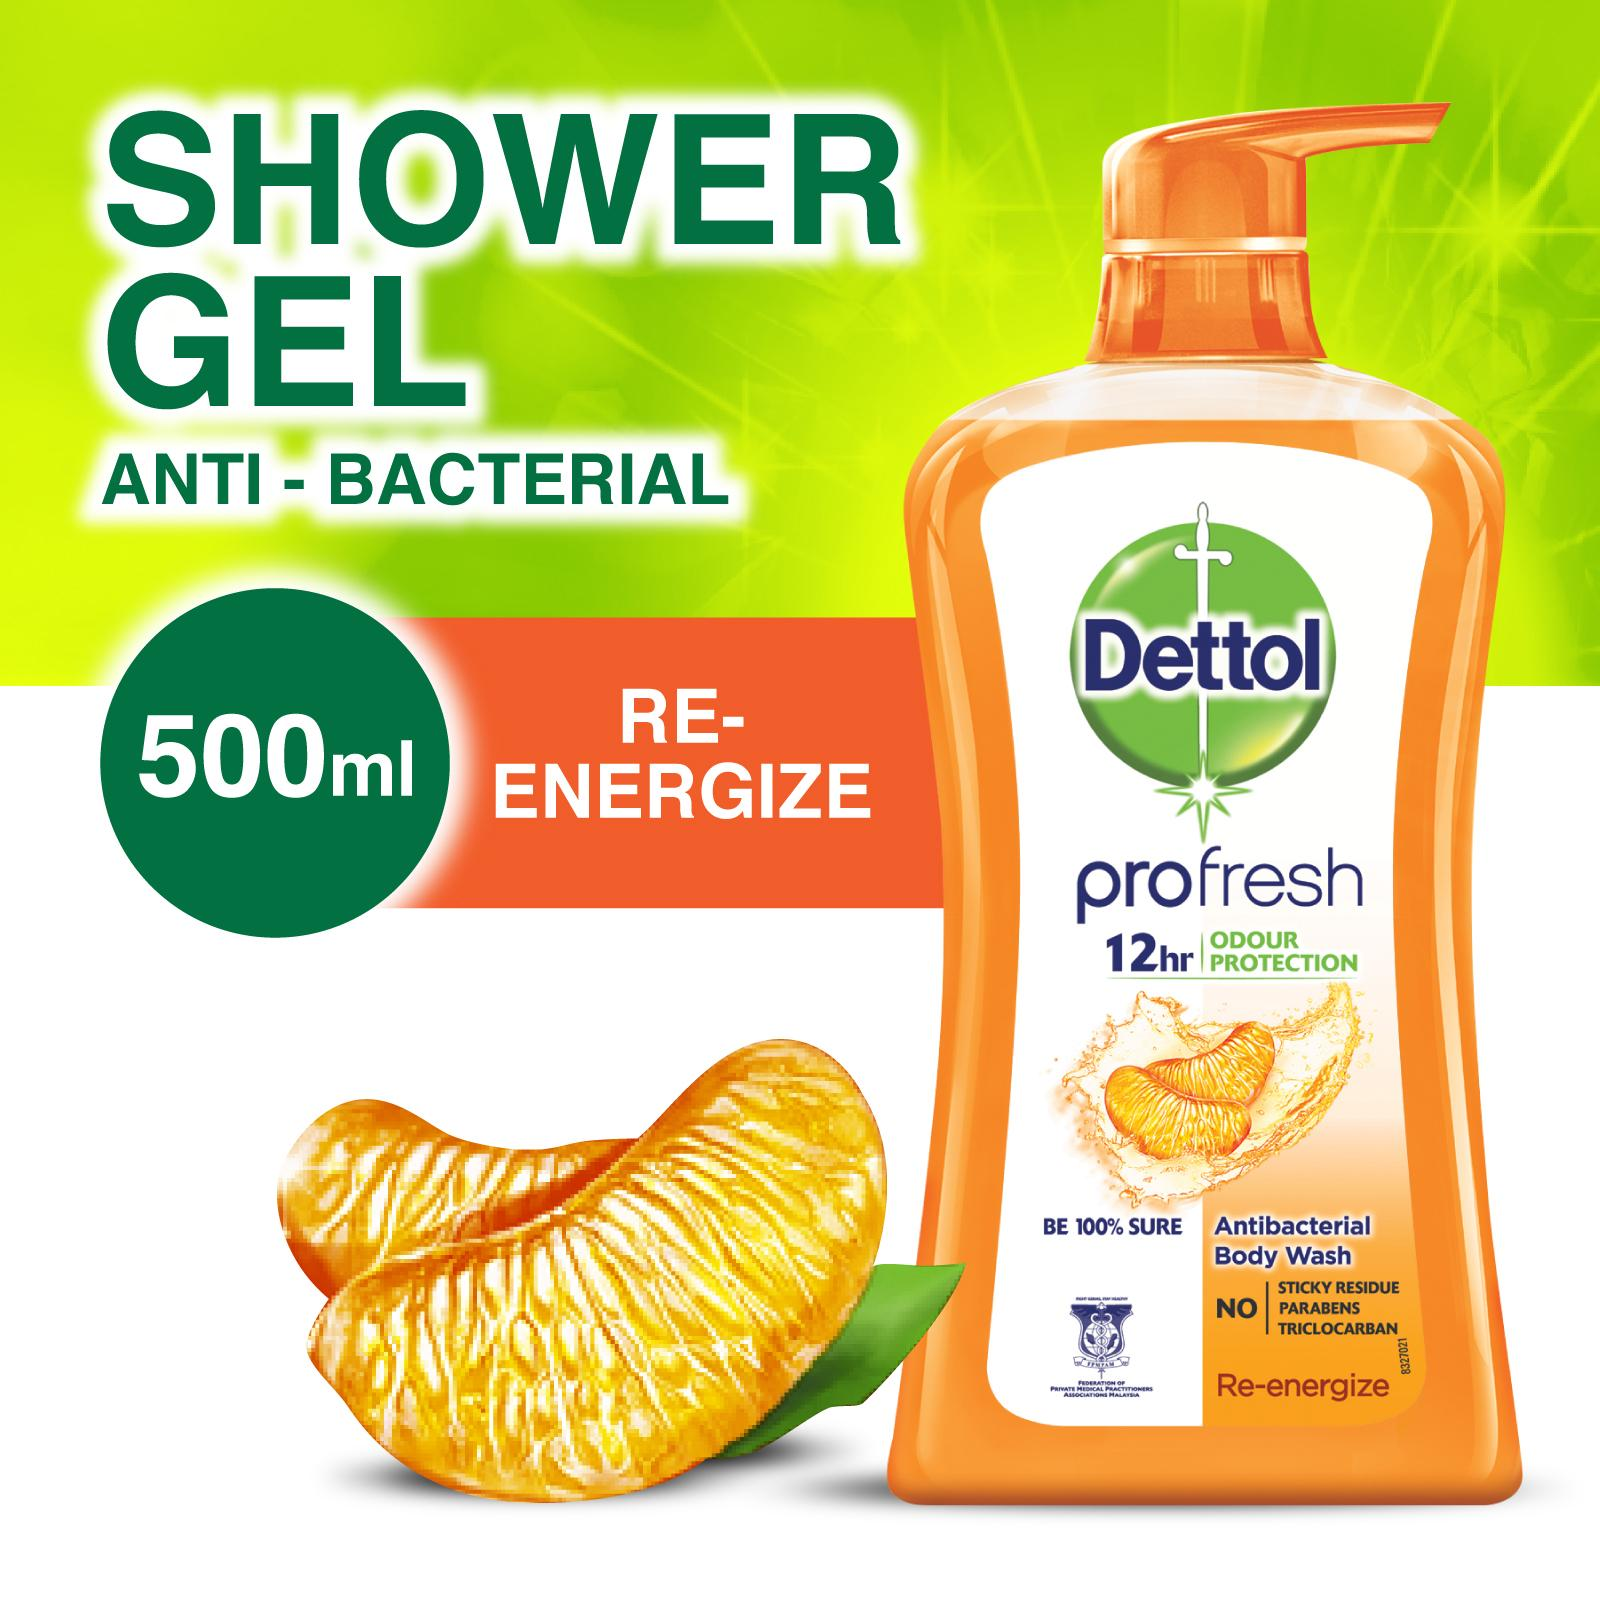 Dettol Shower Gel Re-energize 500ml